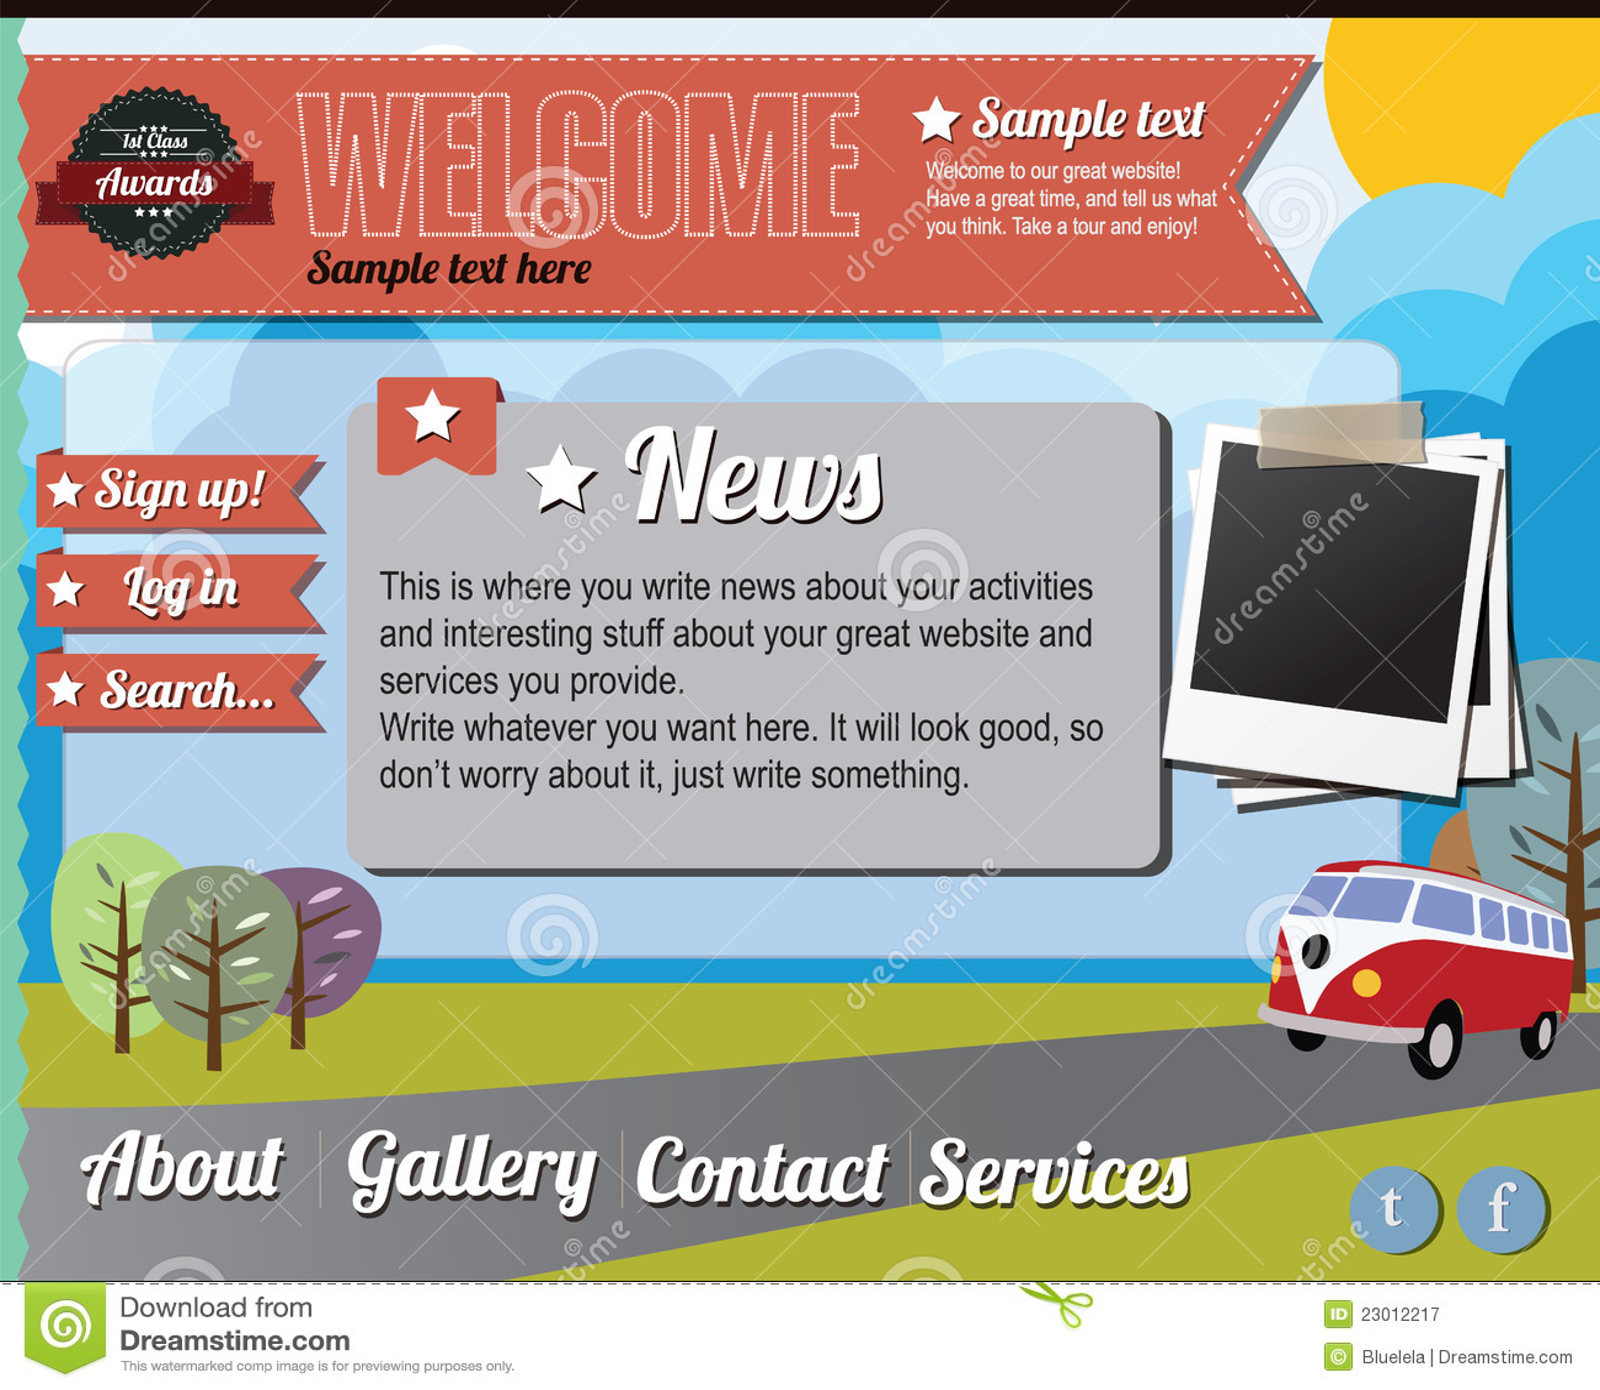 Studio Lighting Website: Website Template Elements, Vintage Style Royalty Free